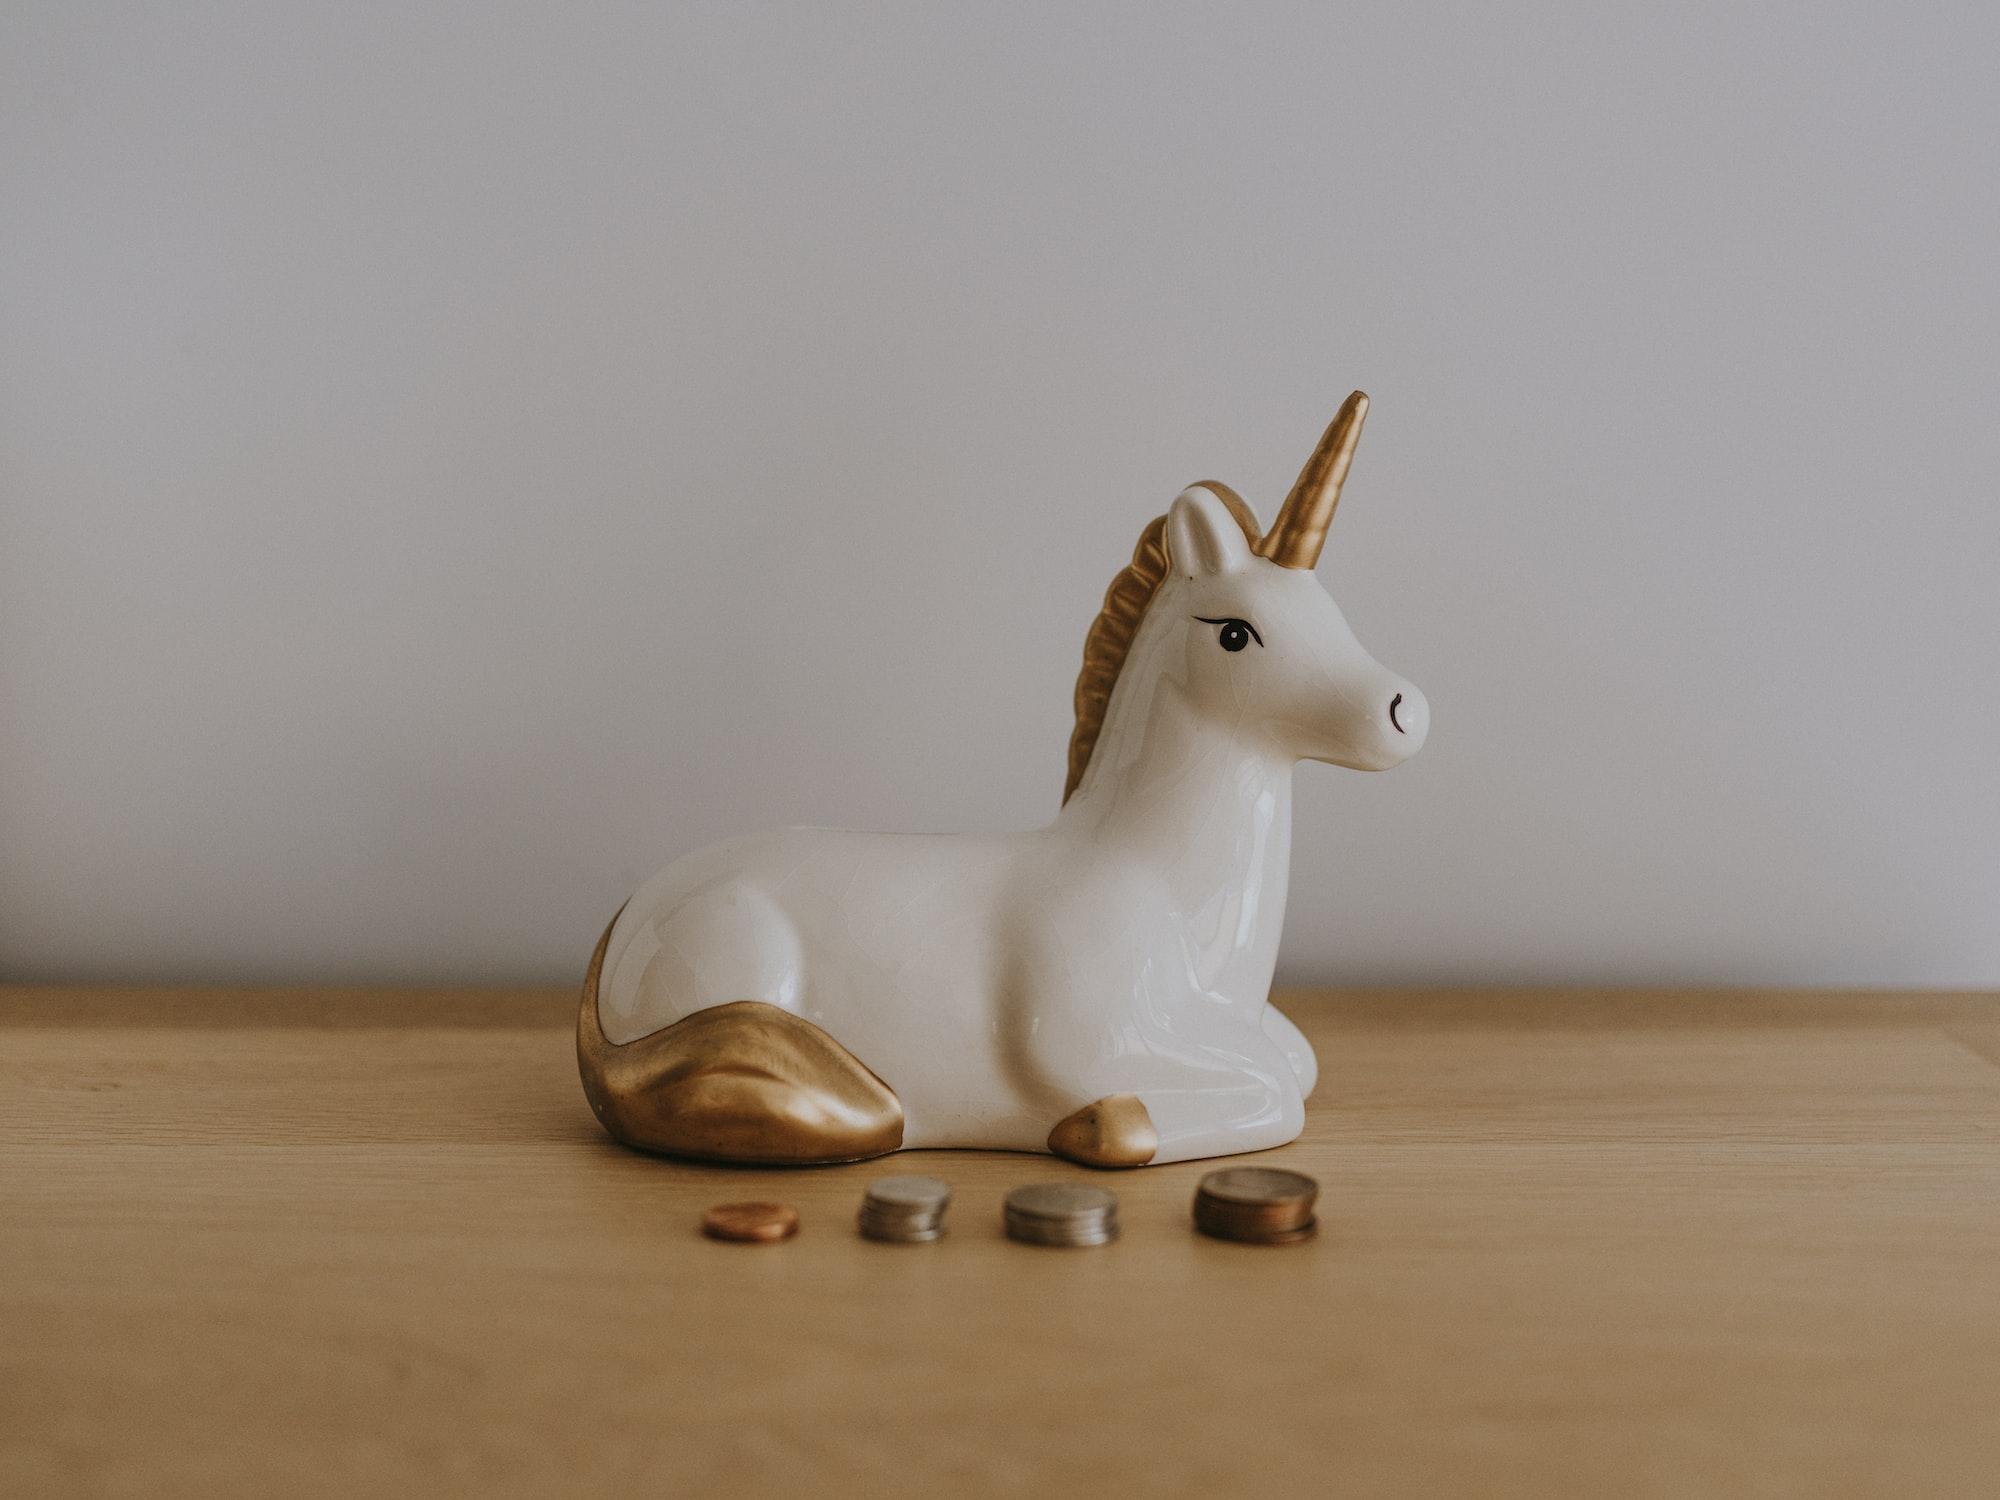 A Unicorn gets its horn: Papaya Global raises $100M at $1B+ valuation